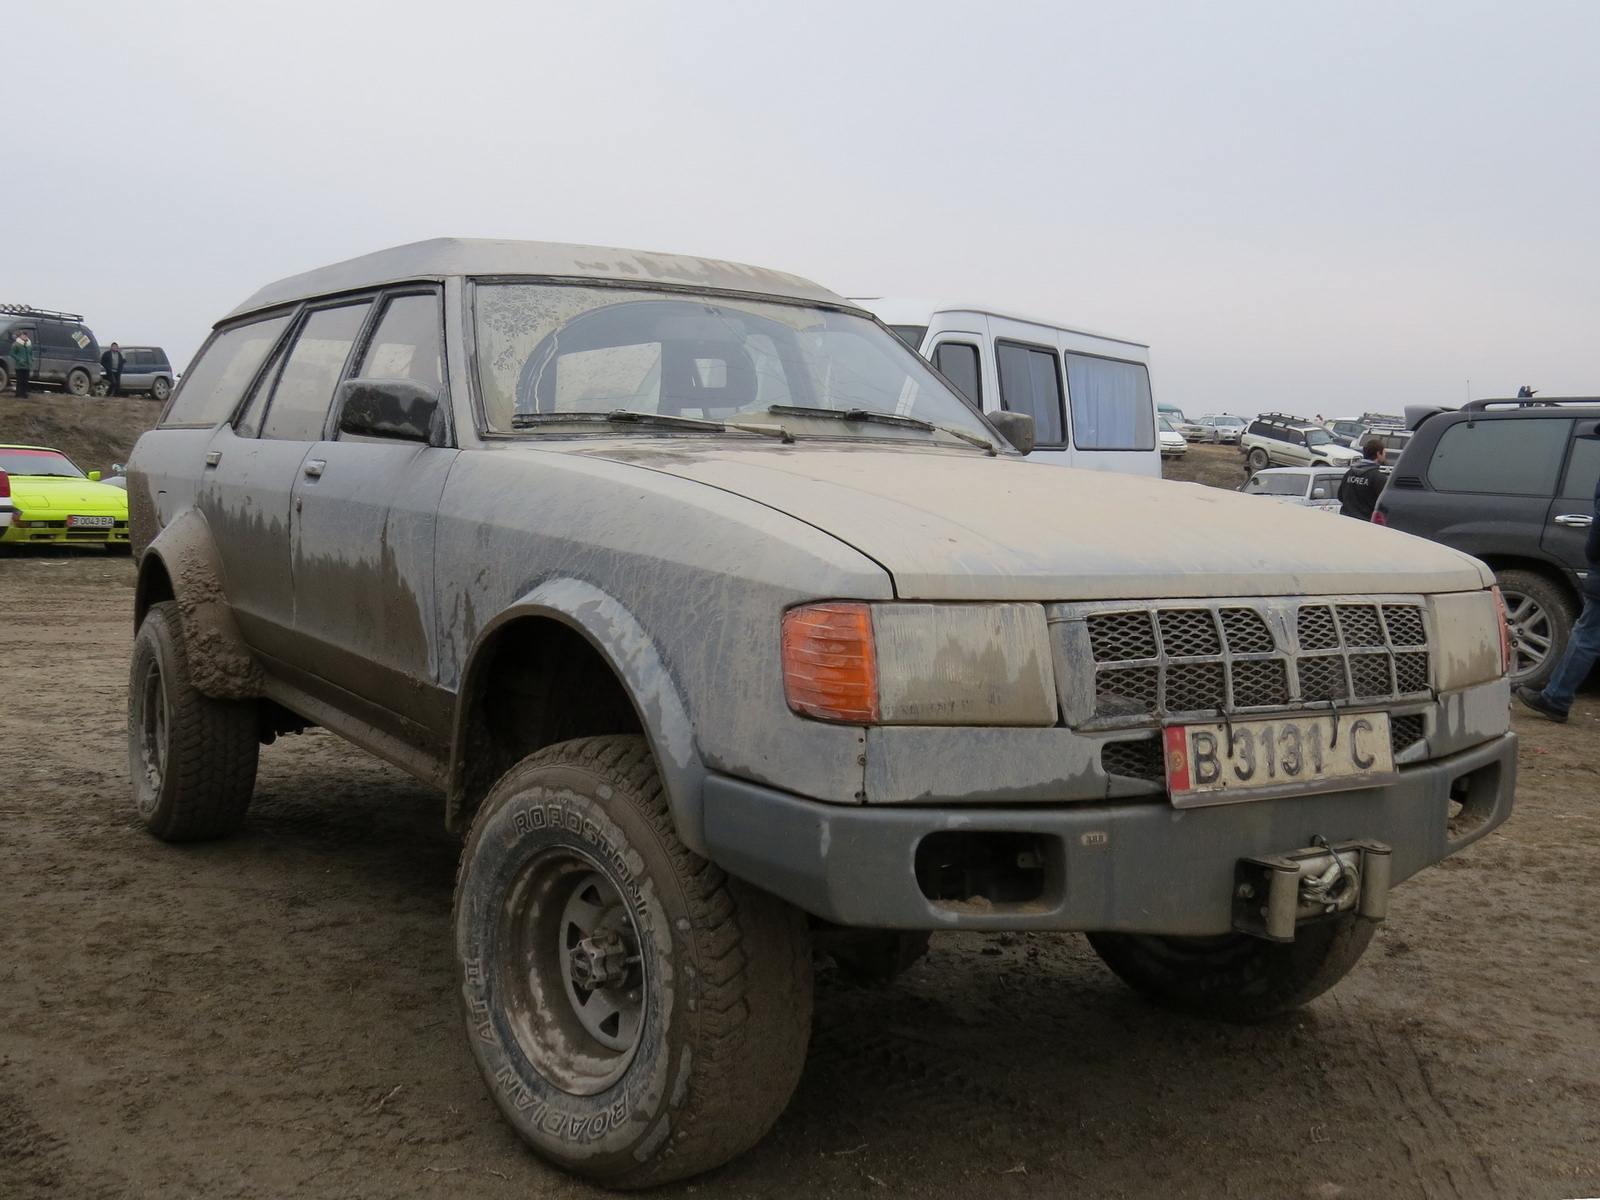 2000 (?). САМАВТО. Кыргызстан. Бишкек. Автор неизвестен. Агрегатная база Ford Granada